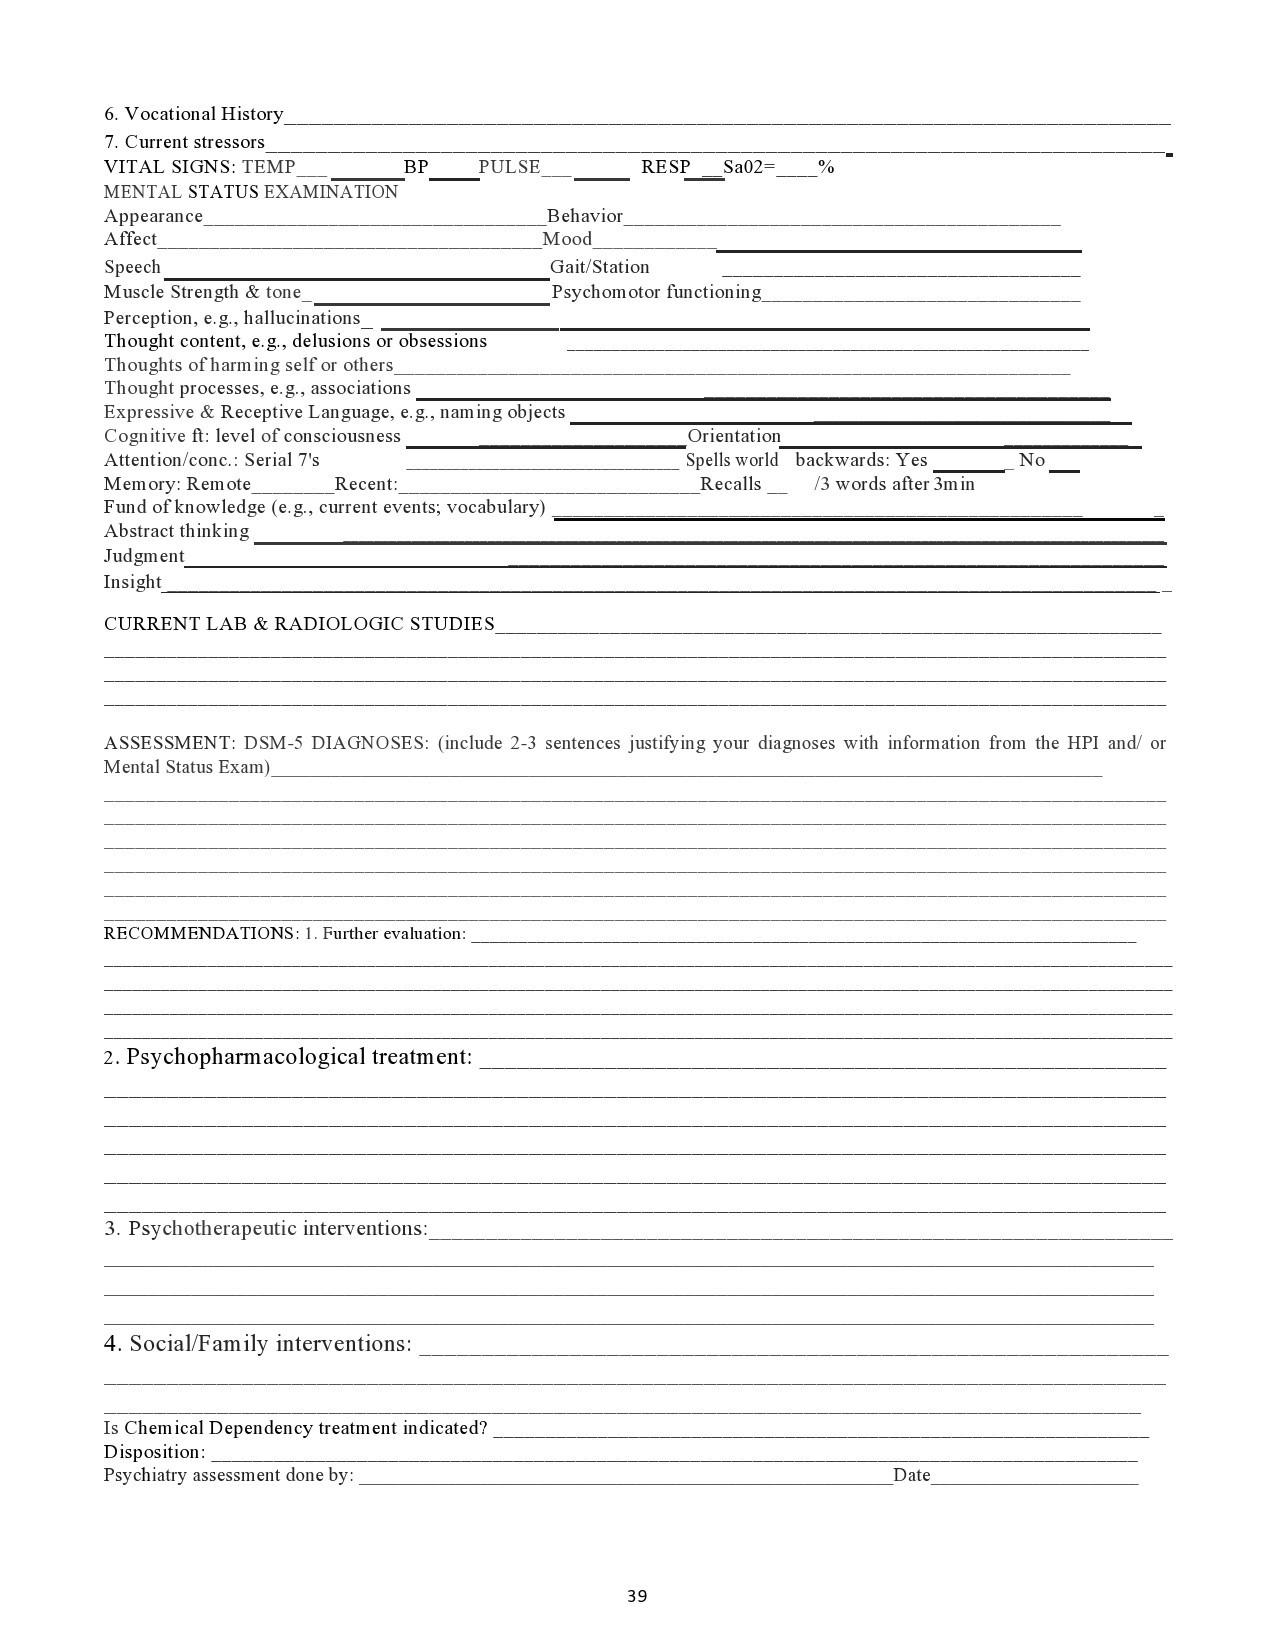 Free mental status exam template 21